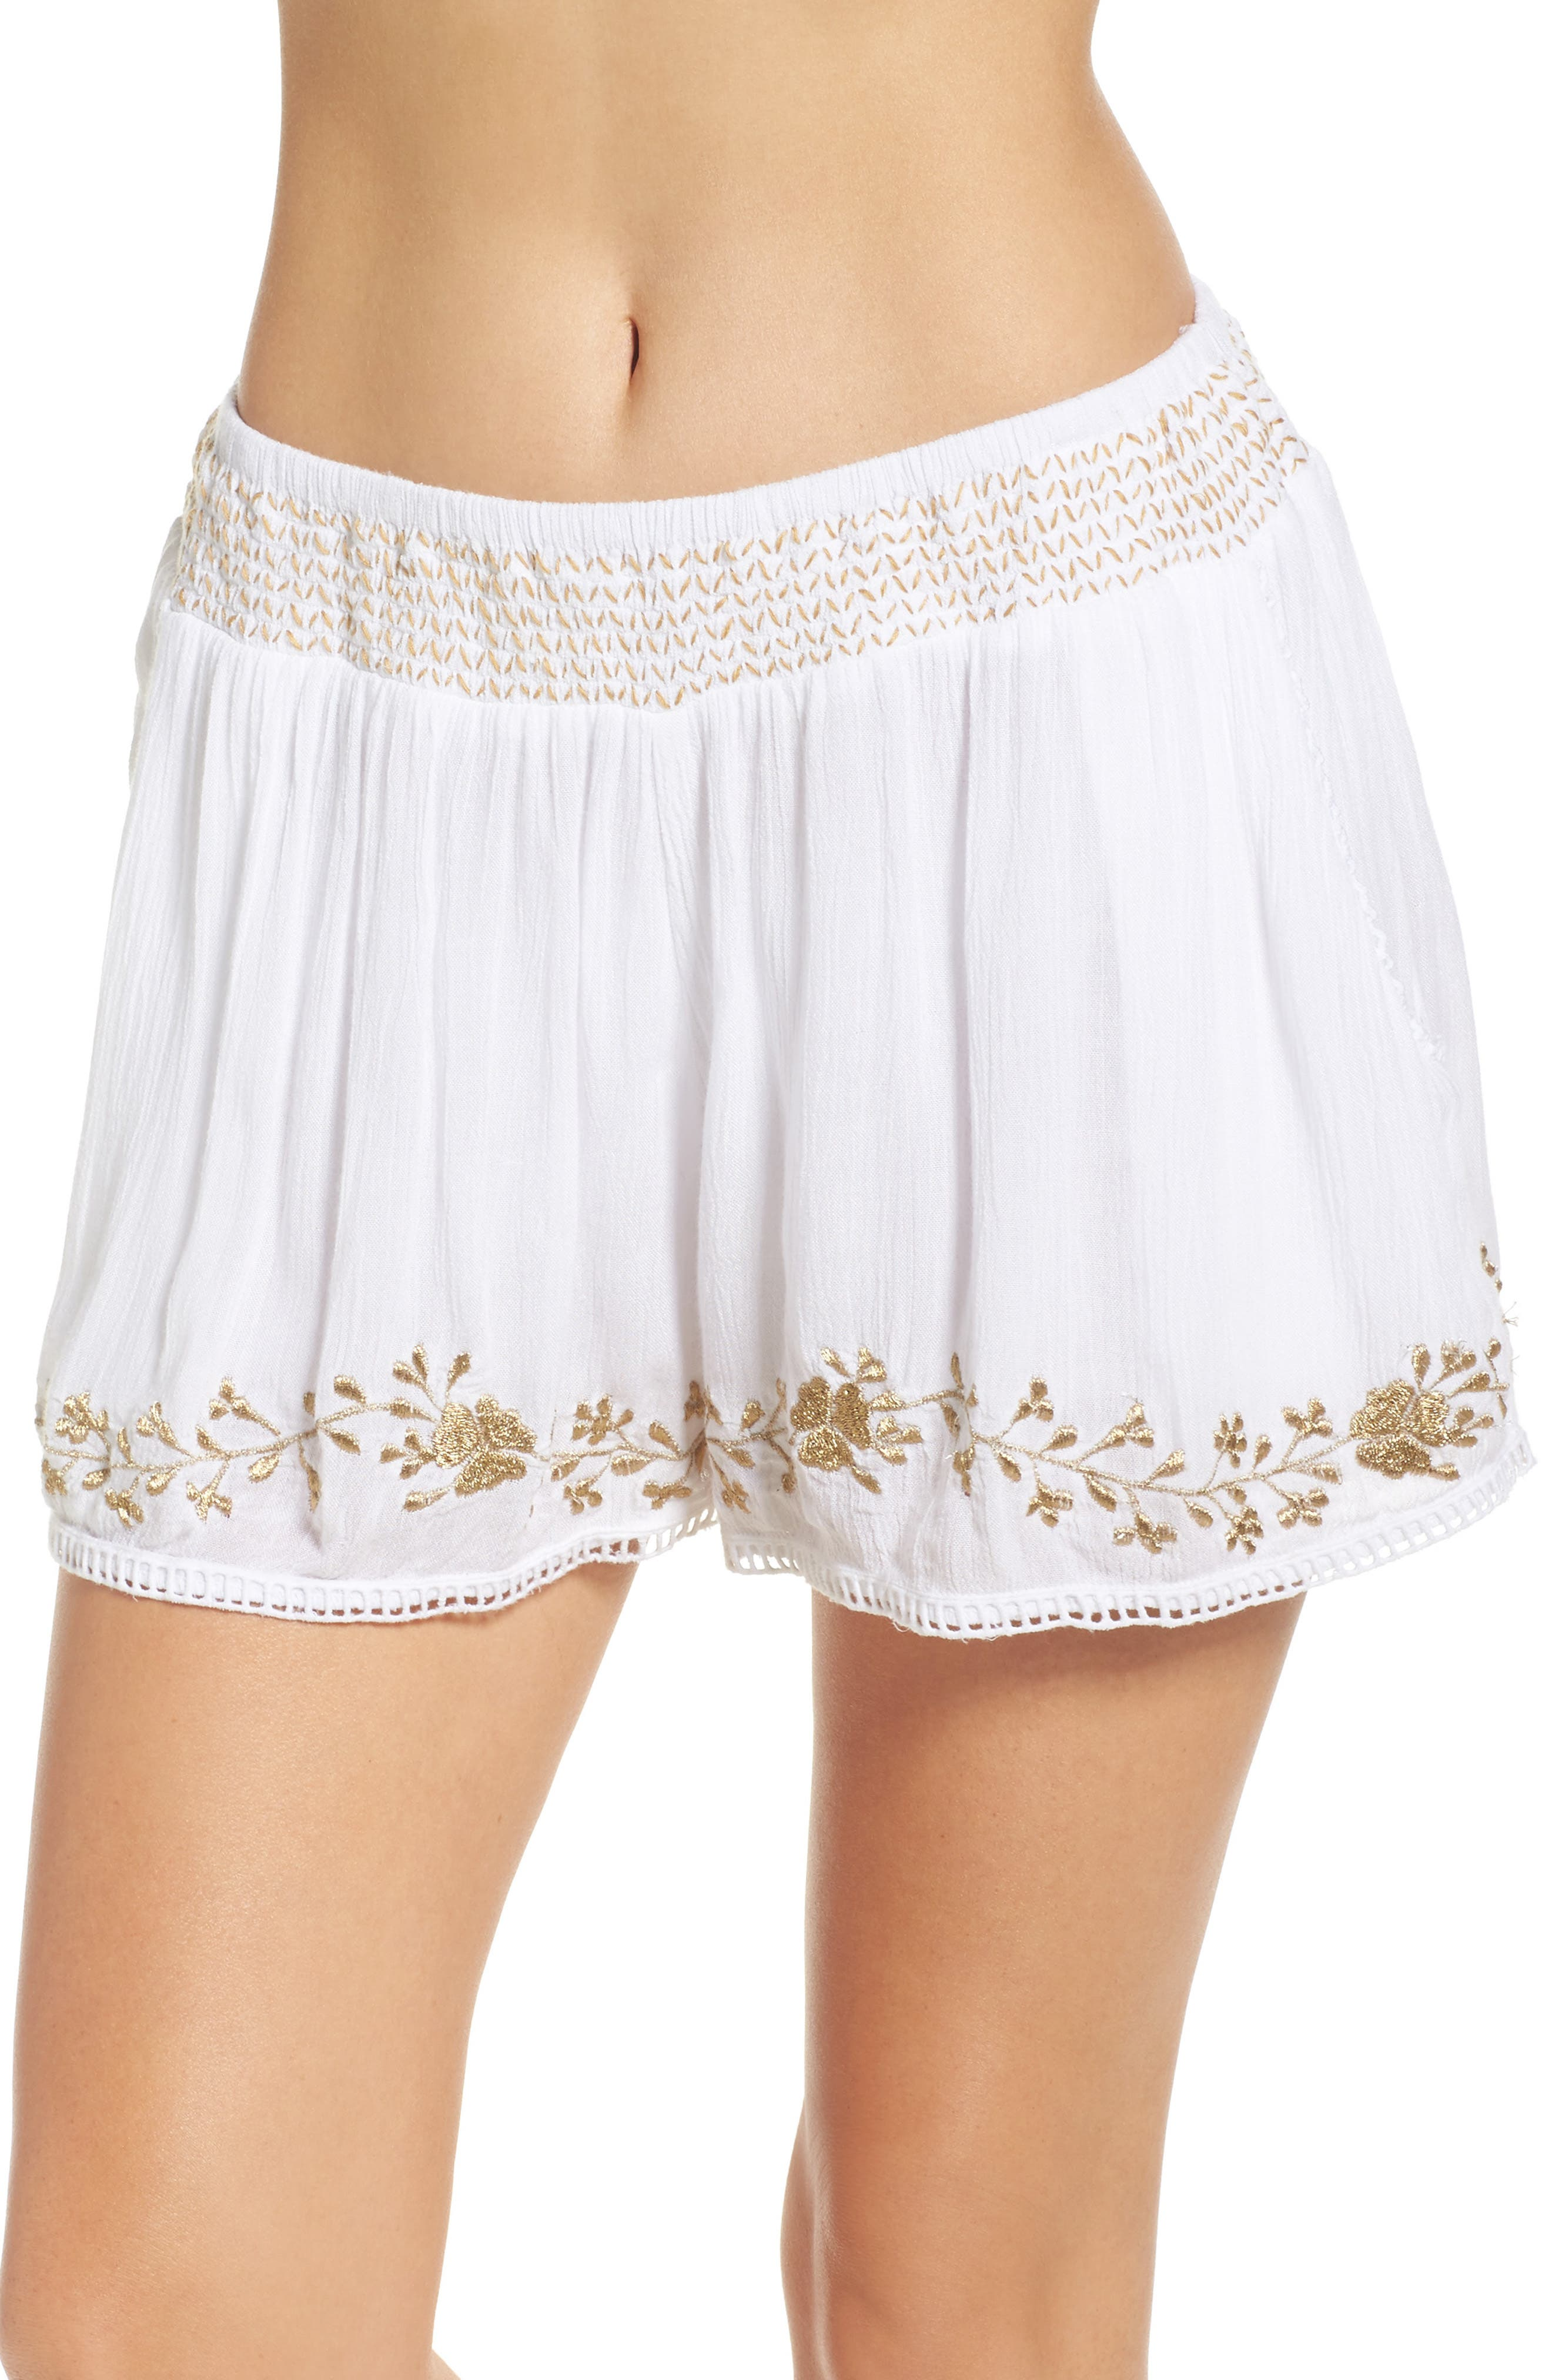 Muche at Muchette Cleopatra Shorts,                         Main,                         color, White/ Gold